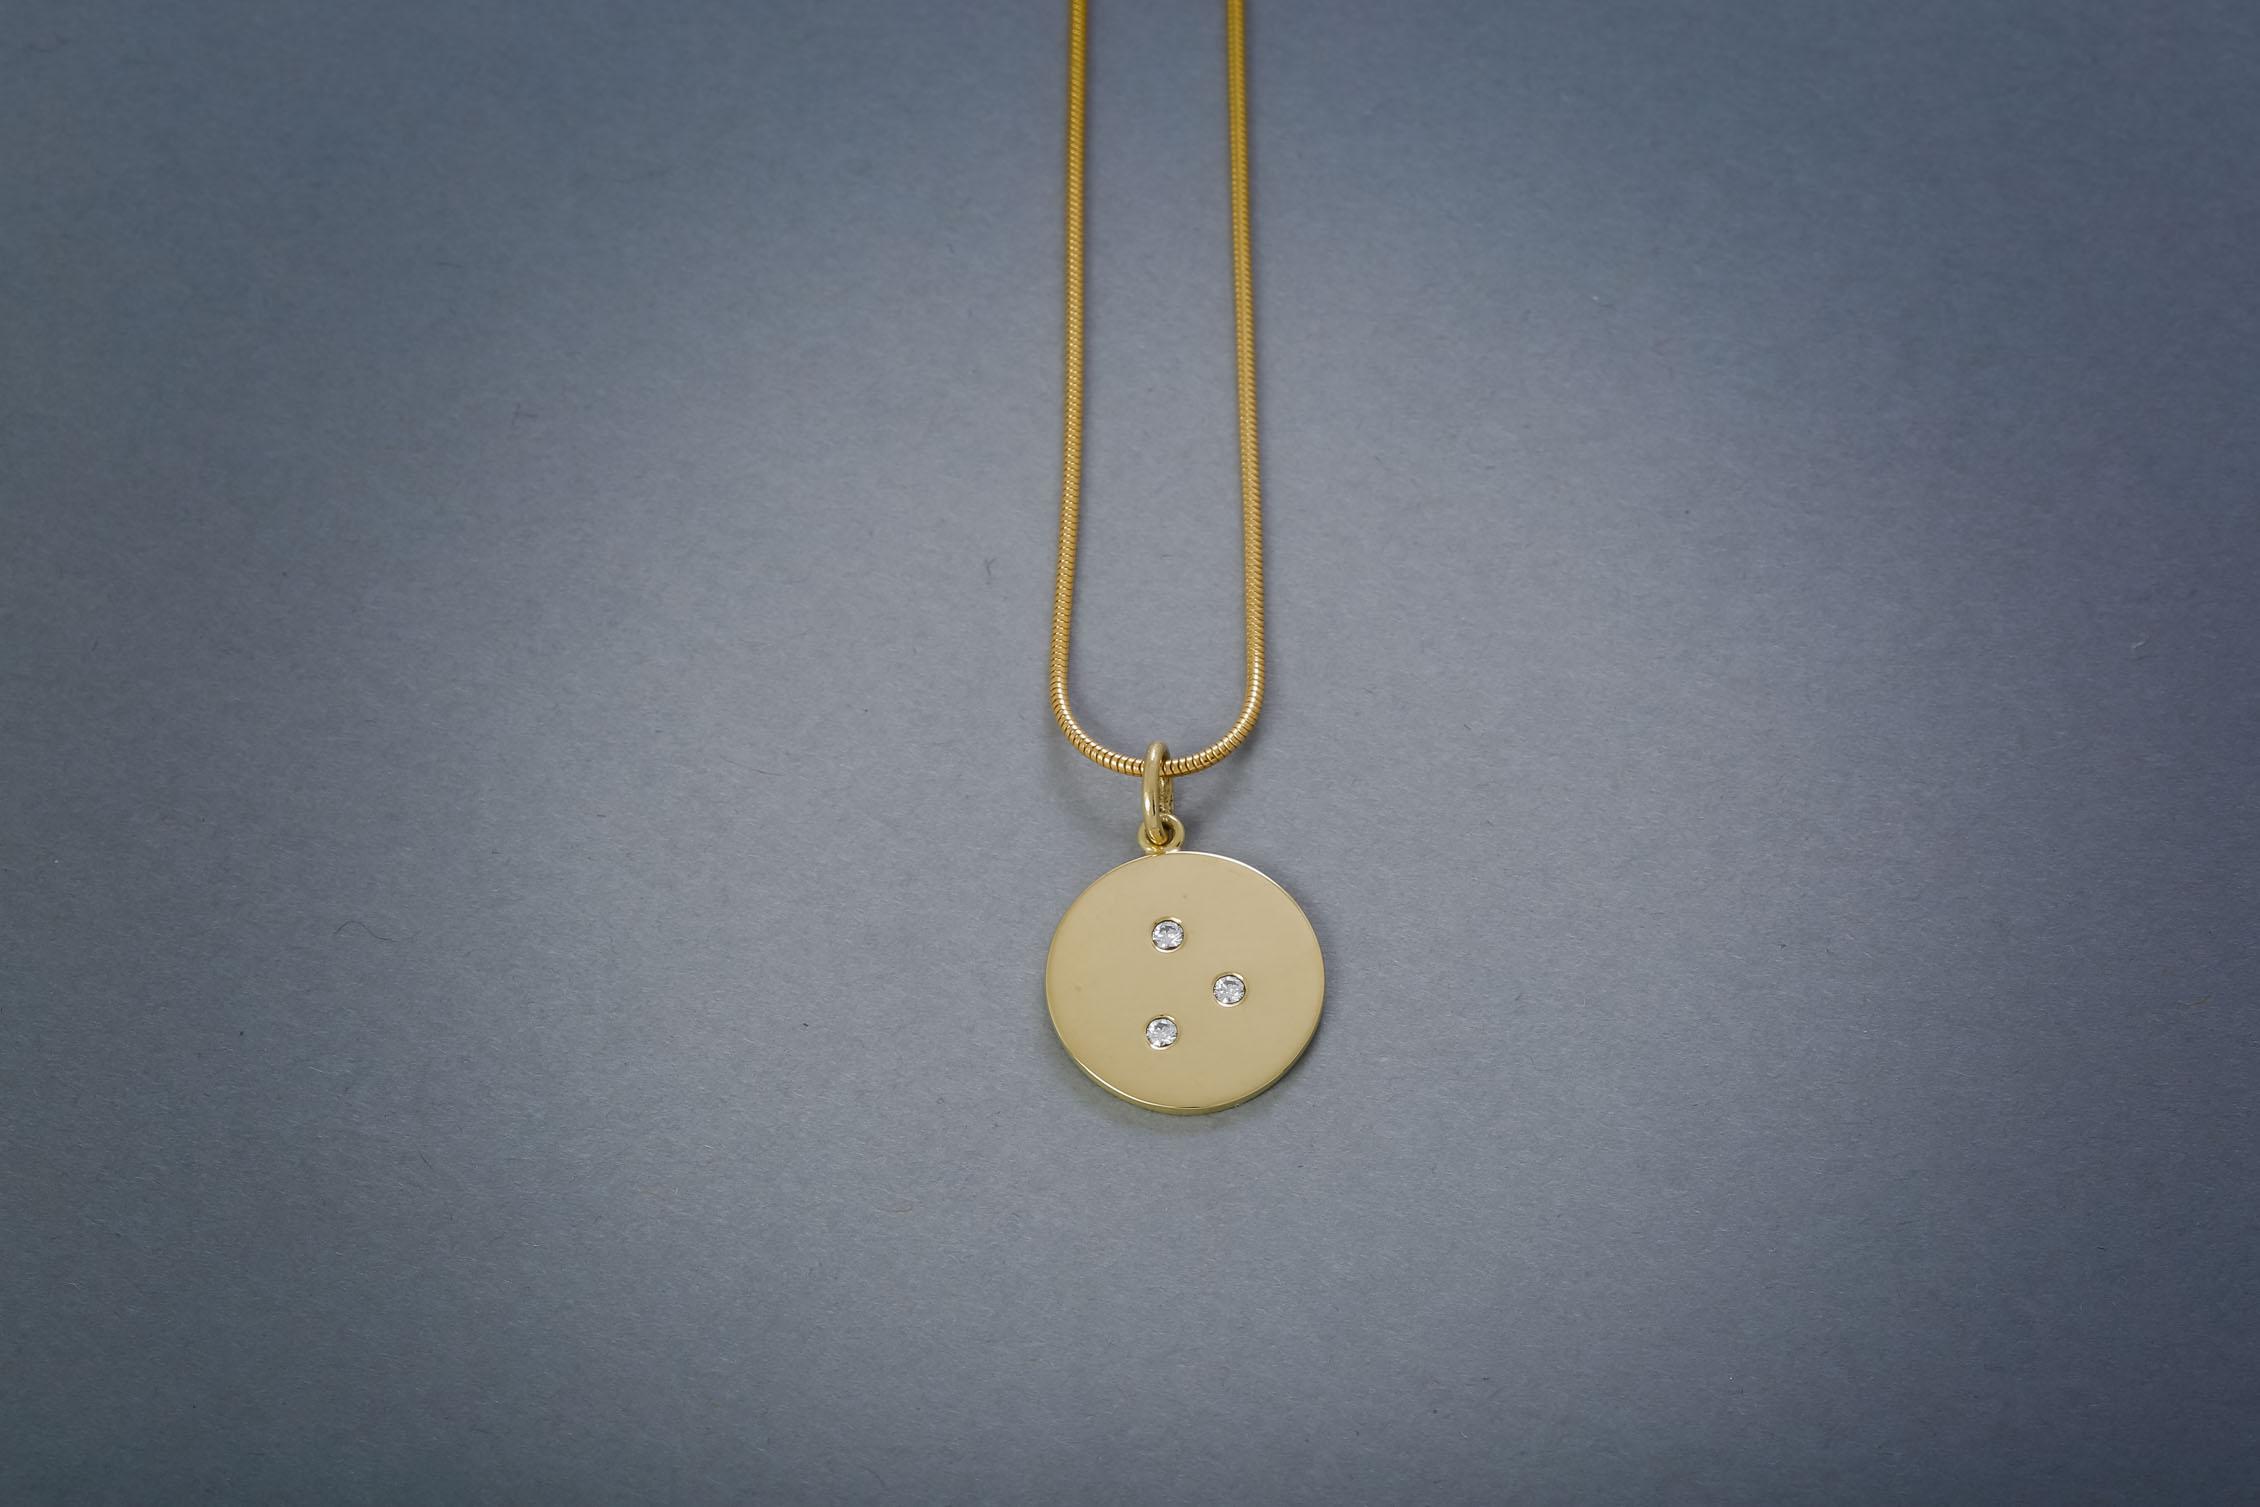 100 Goldkette, 18kt, Brillant ab €982,-